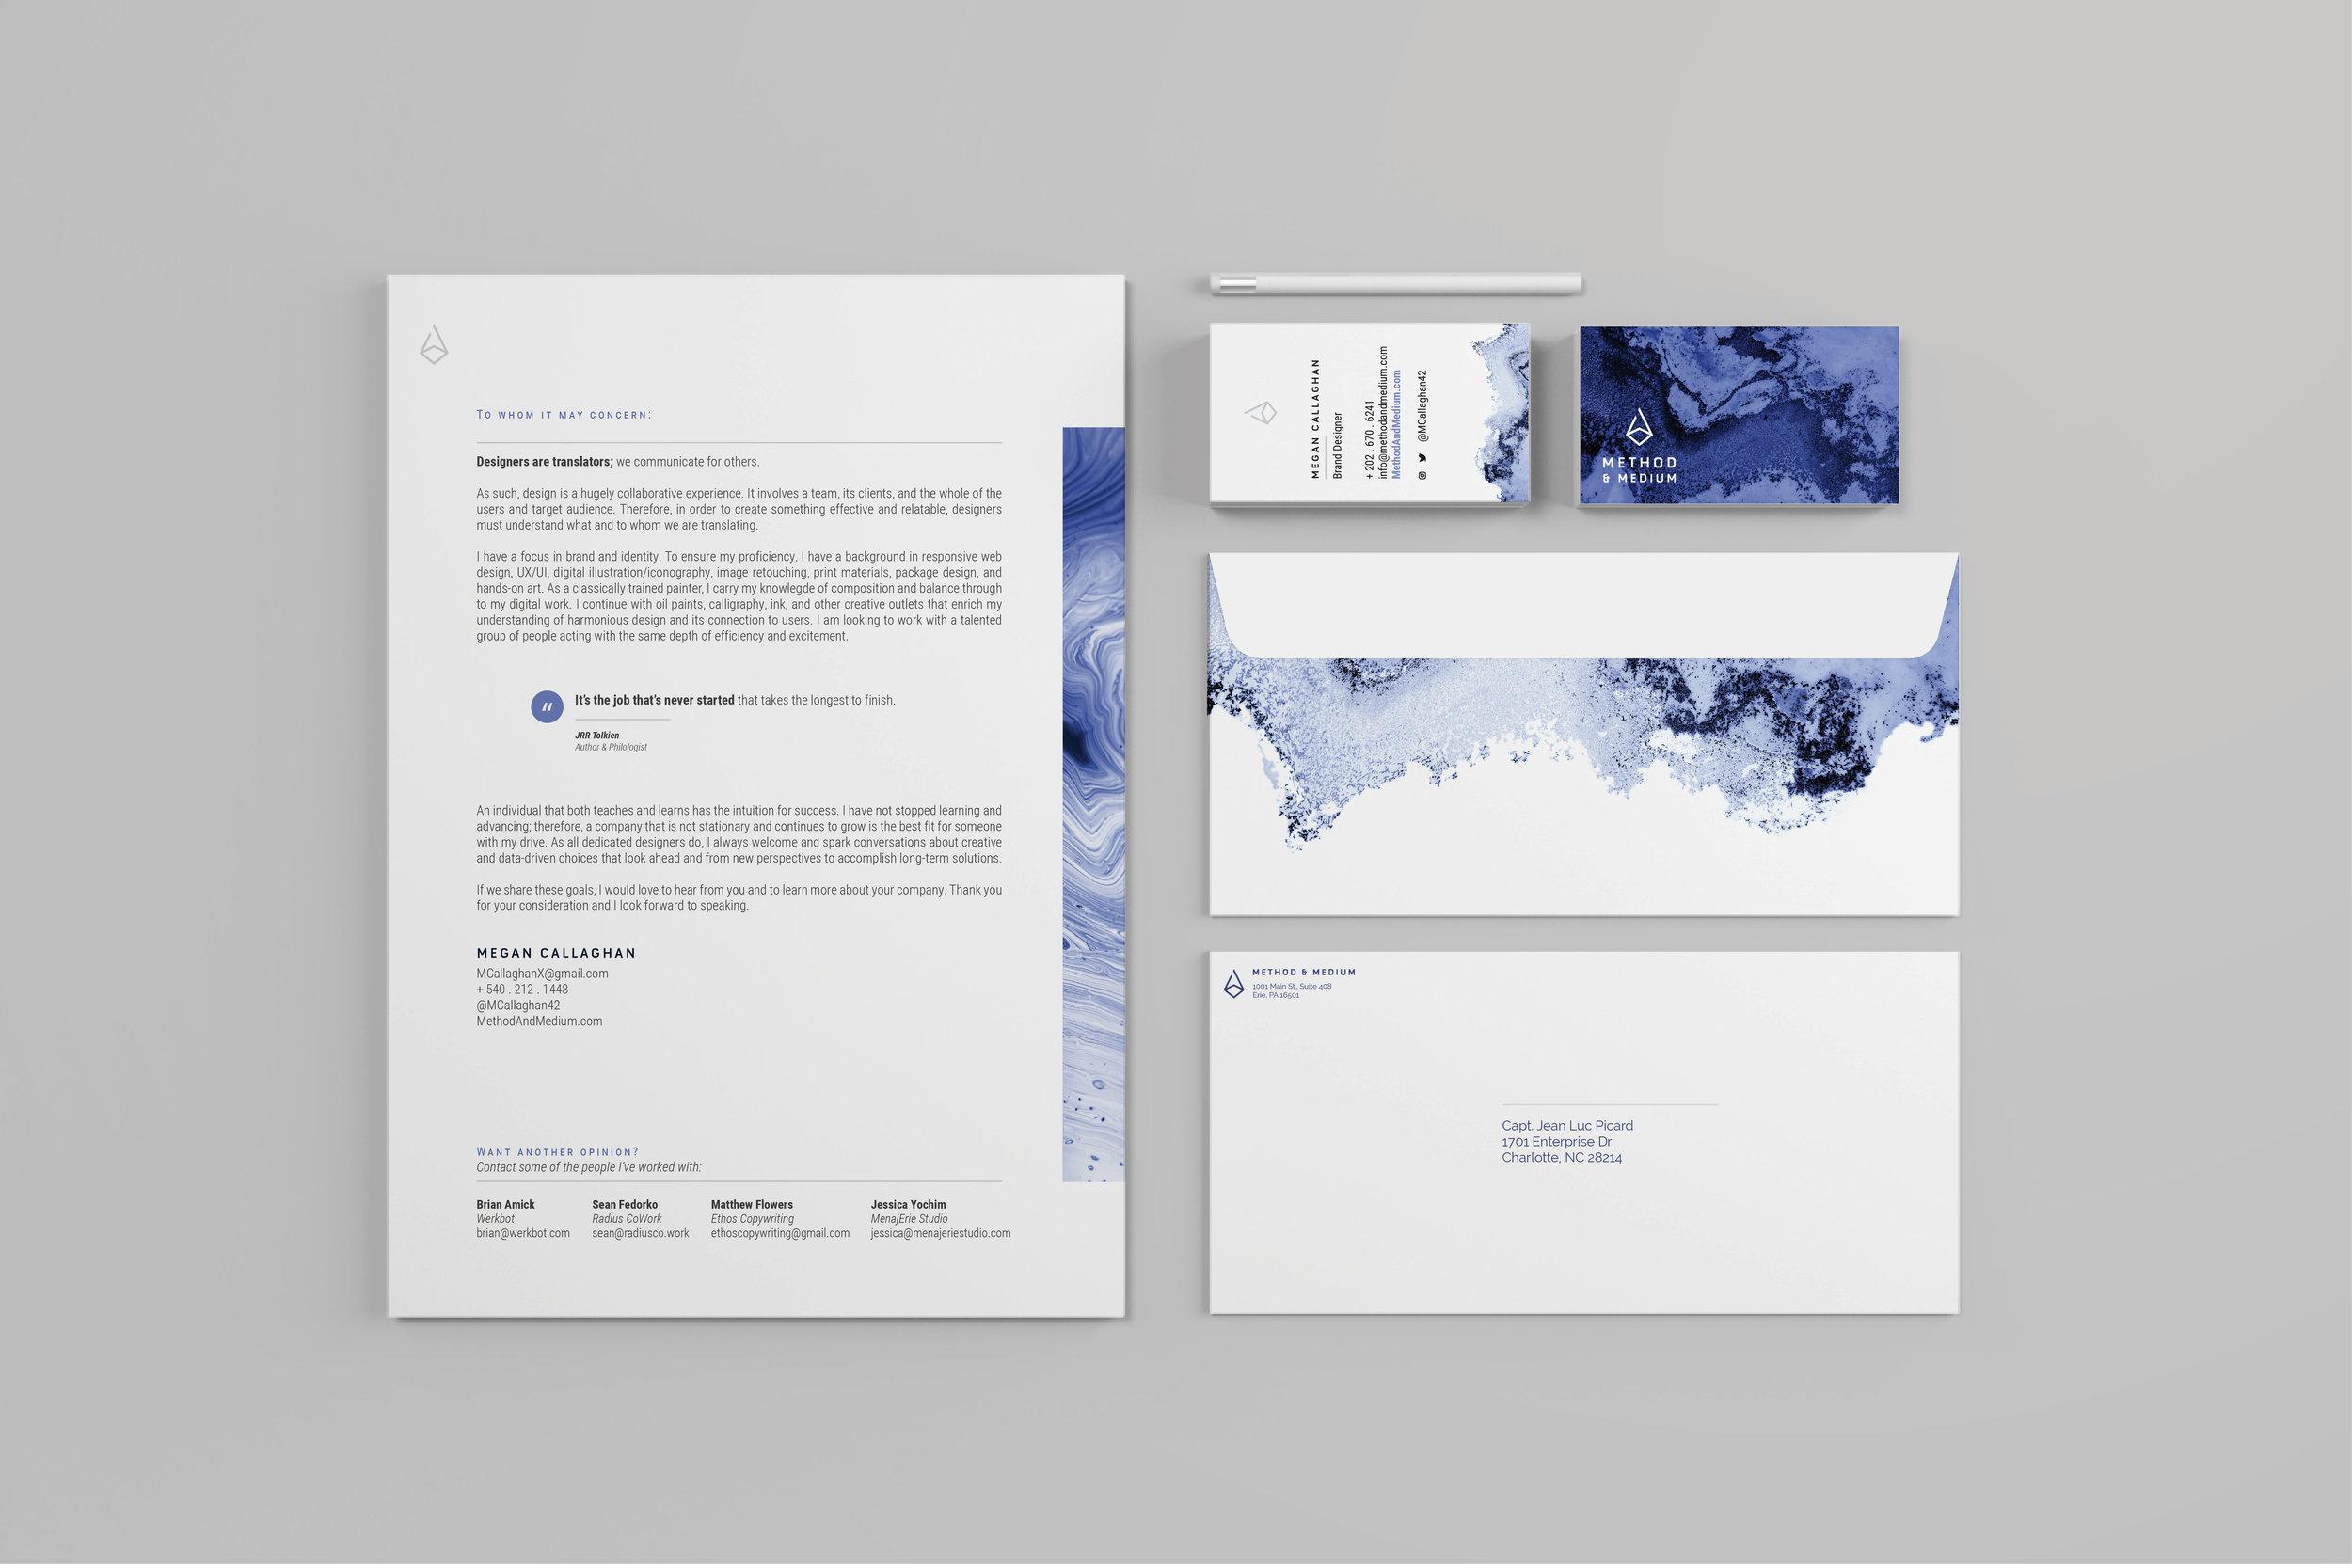 Brand-Mockup-01.jpg